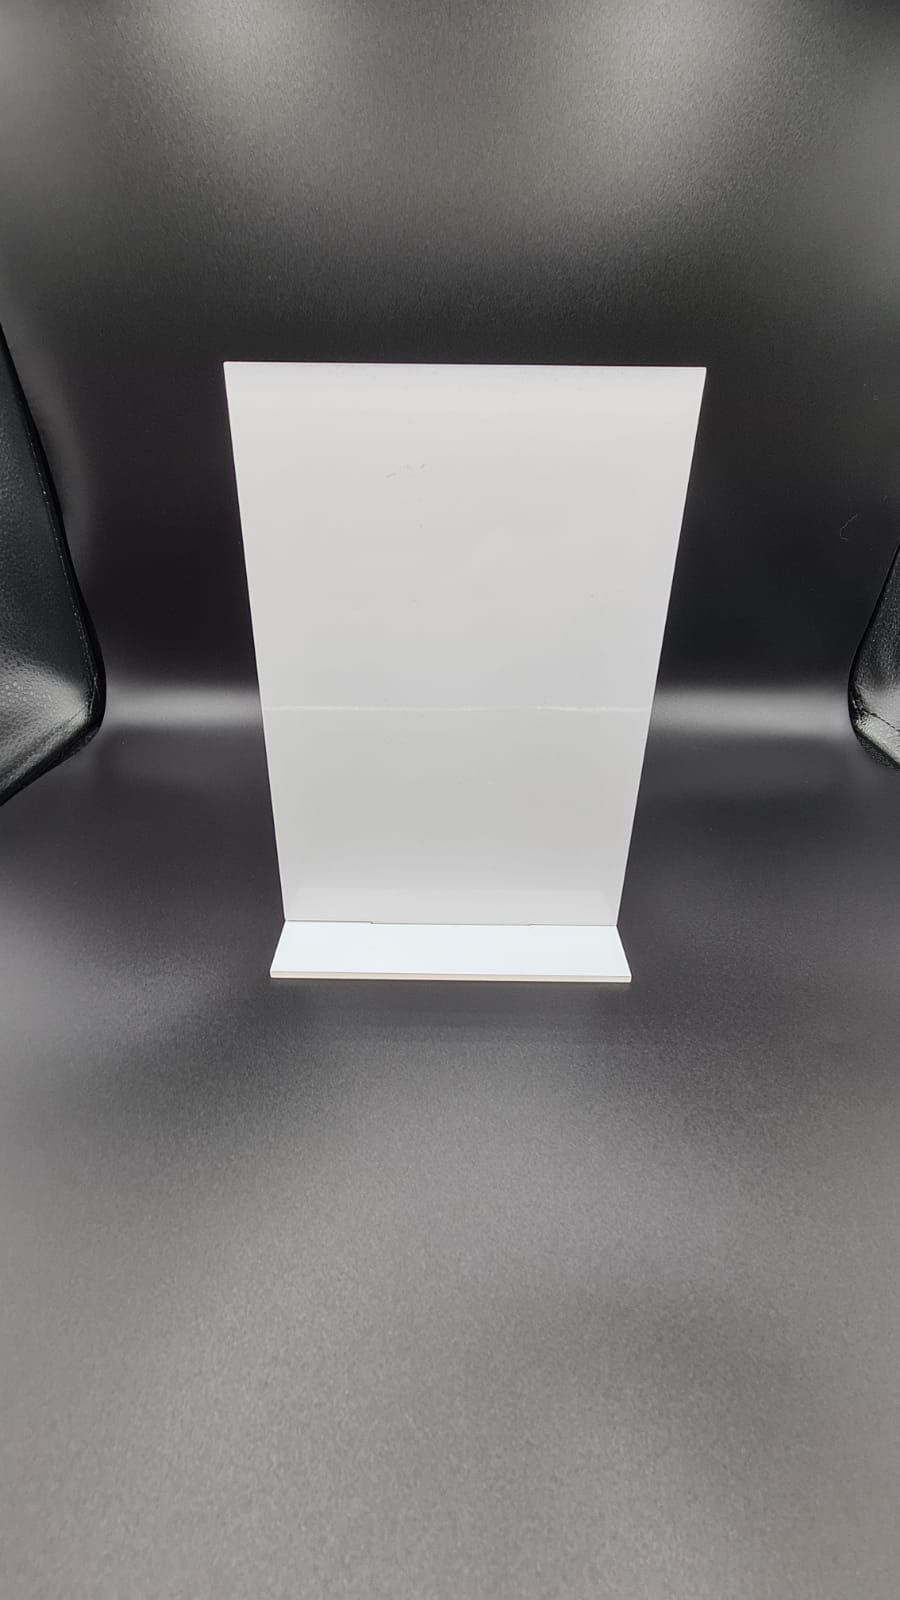 Freestanding Acrylic Rectangle - A5 (Portrait)